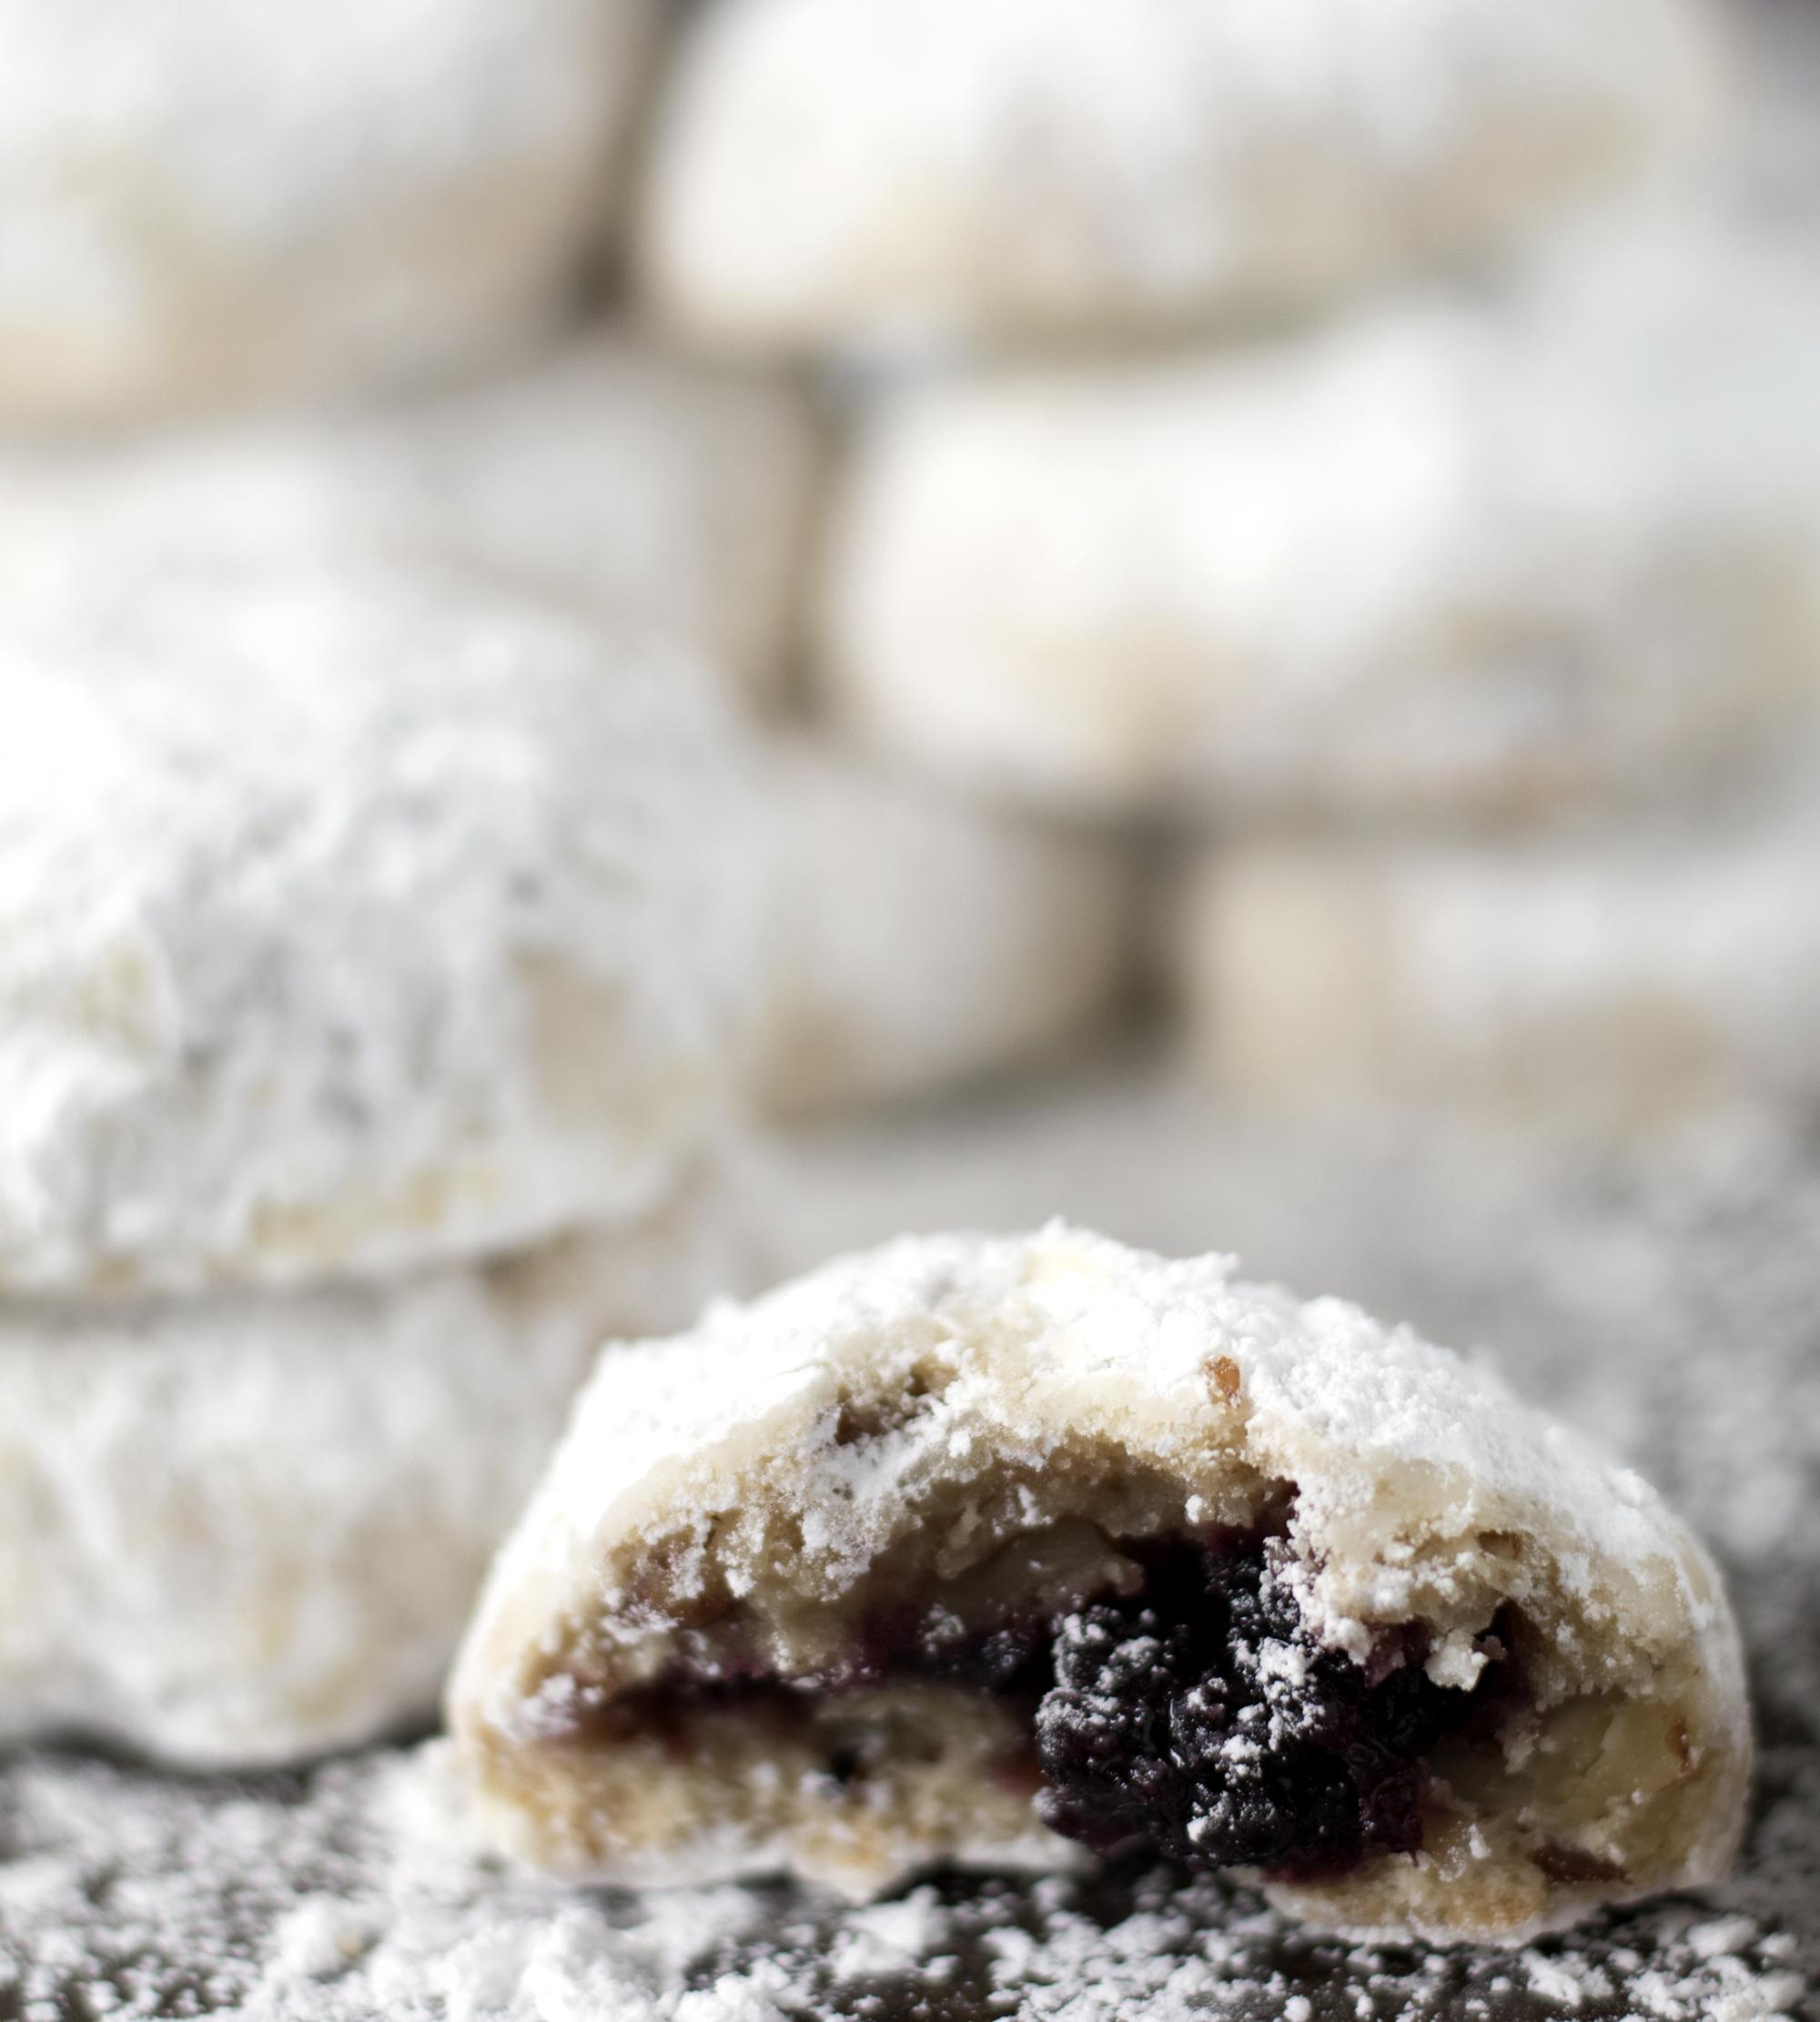 Castle Blackberry Jam Snowball Cookies | Sarah Makes Stuff